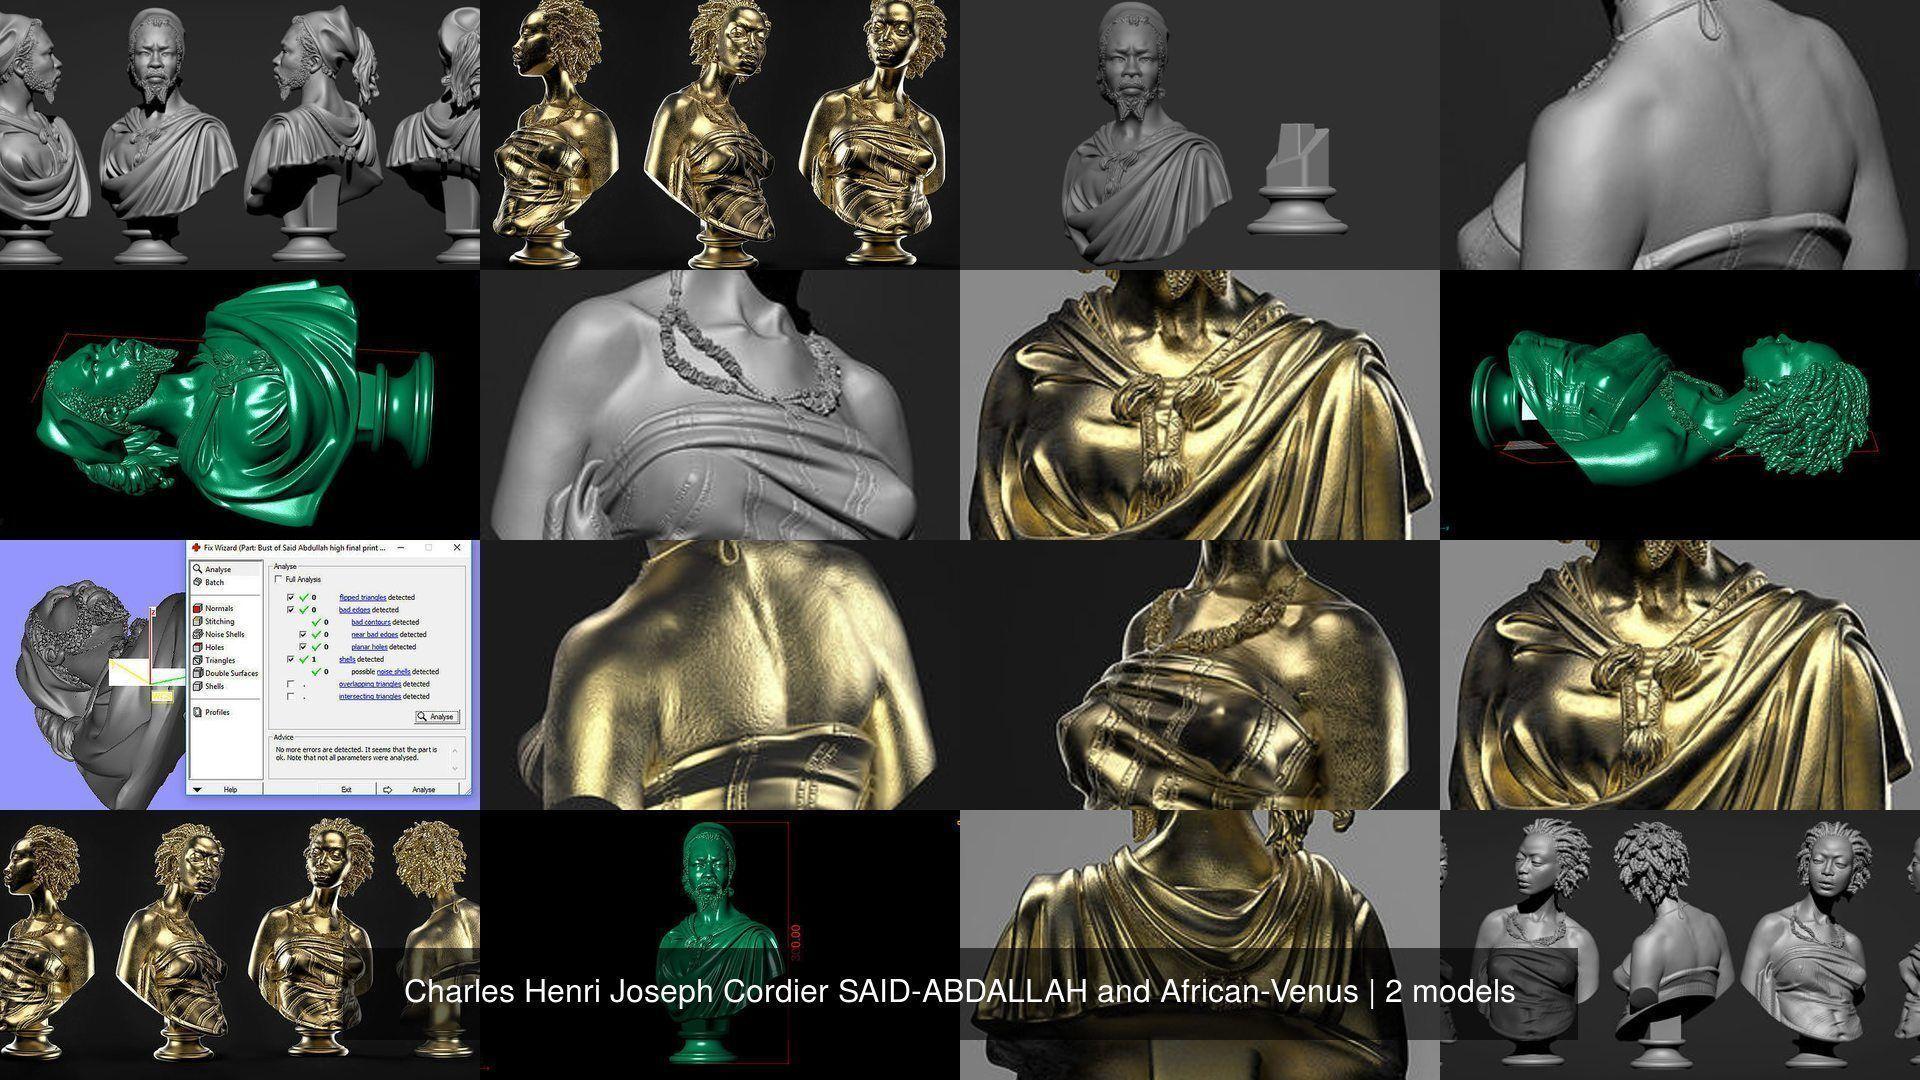 Charles Henri Joseph Cordier SAID-ABDALLAH and African-Venus